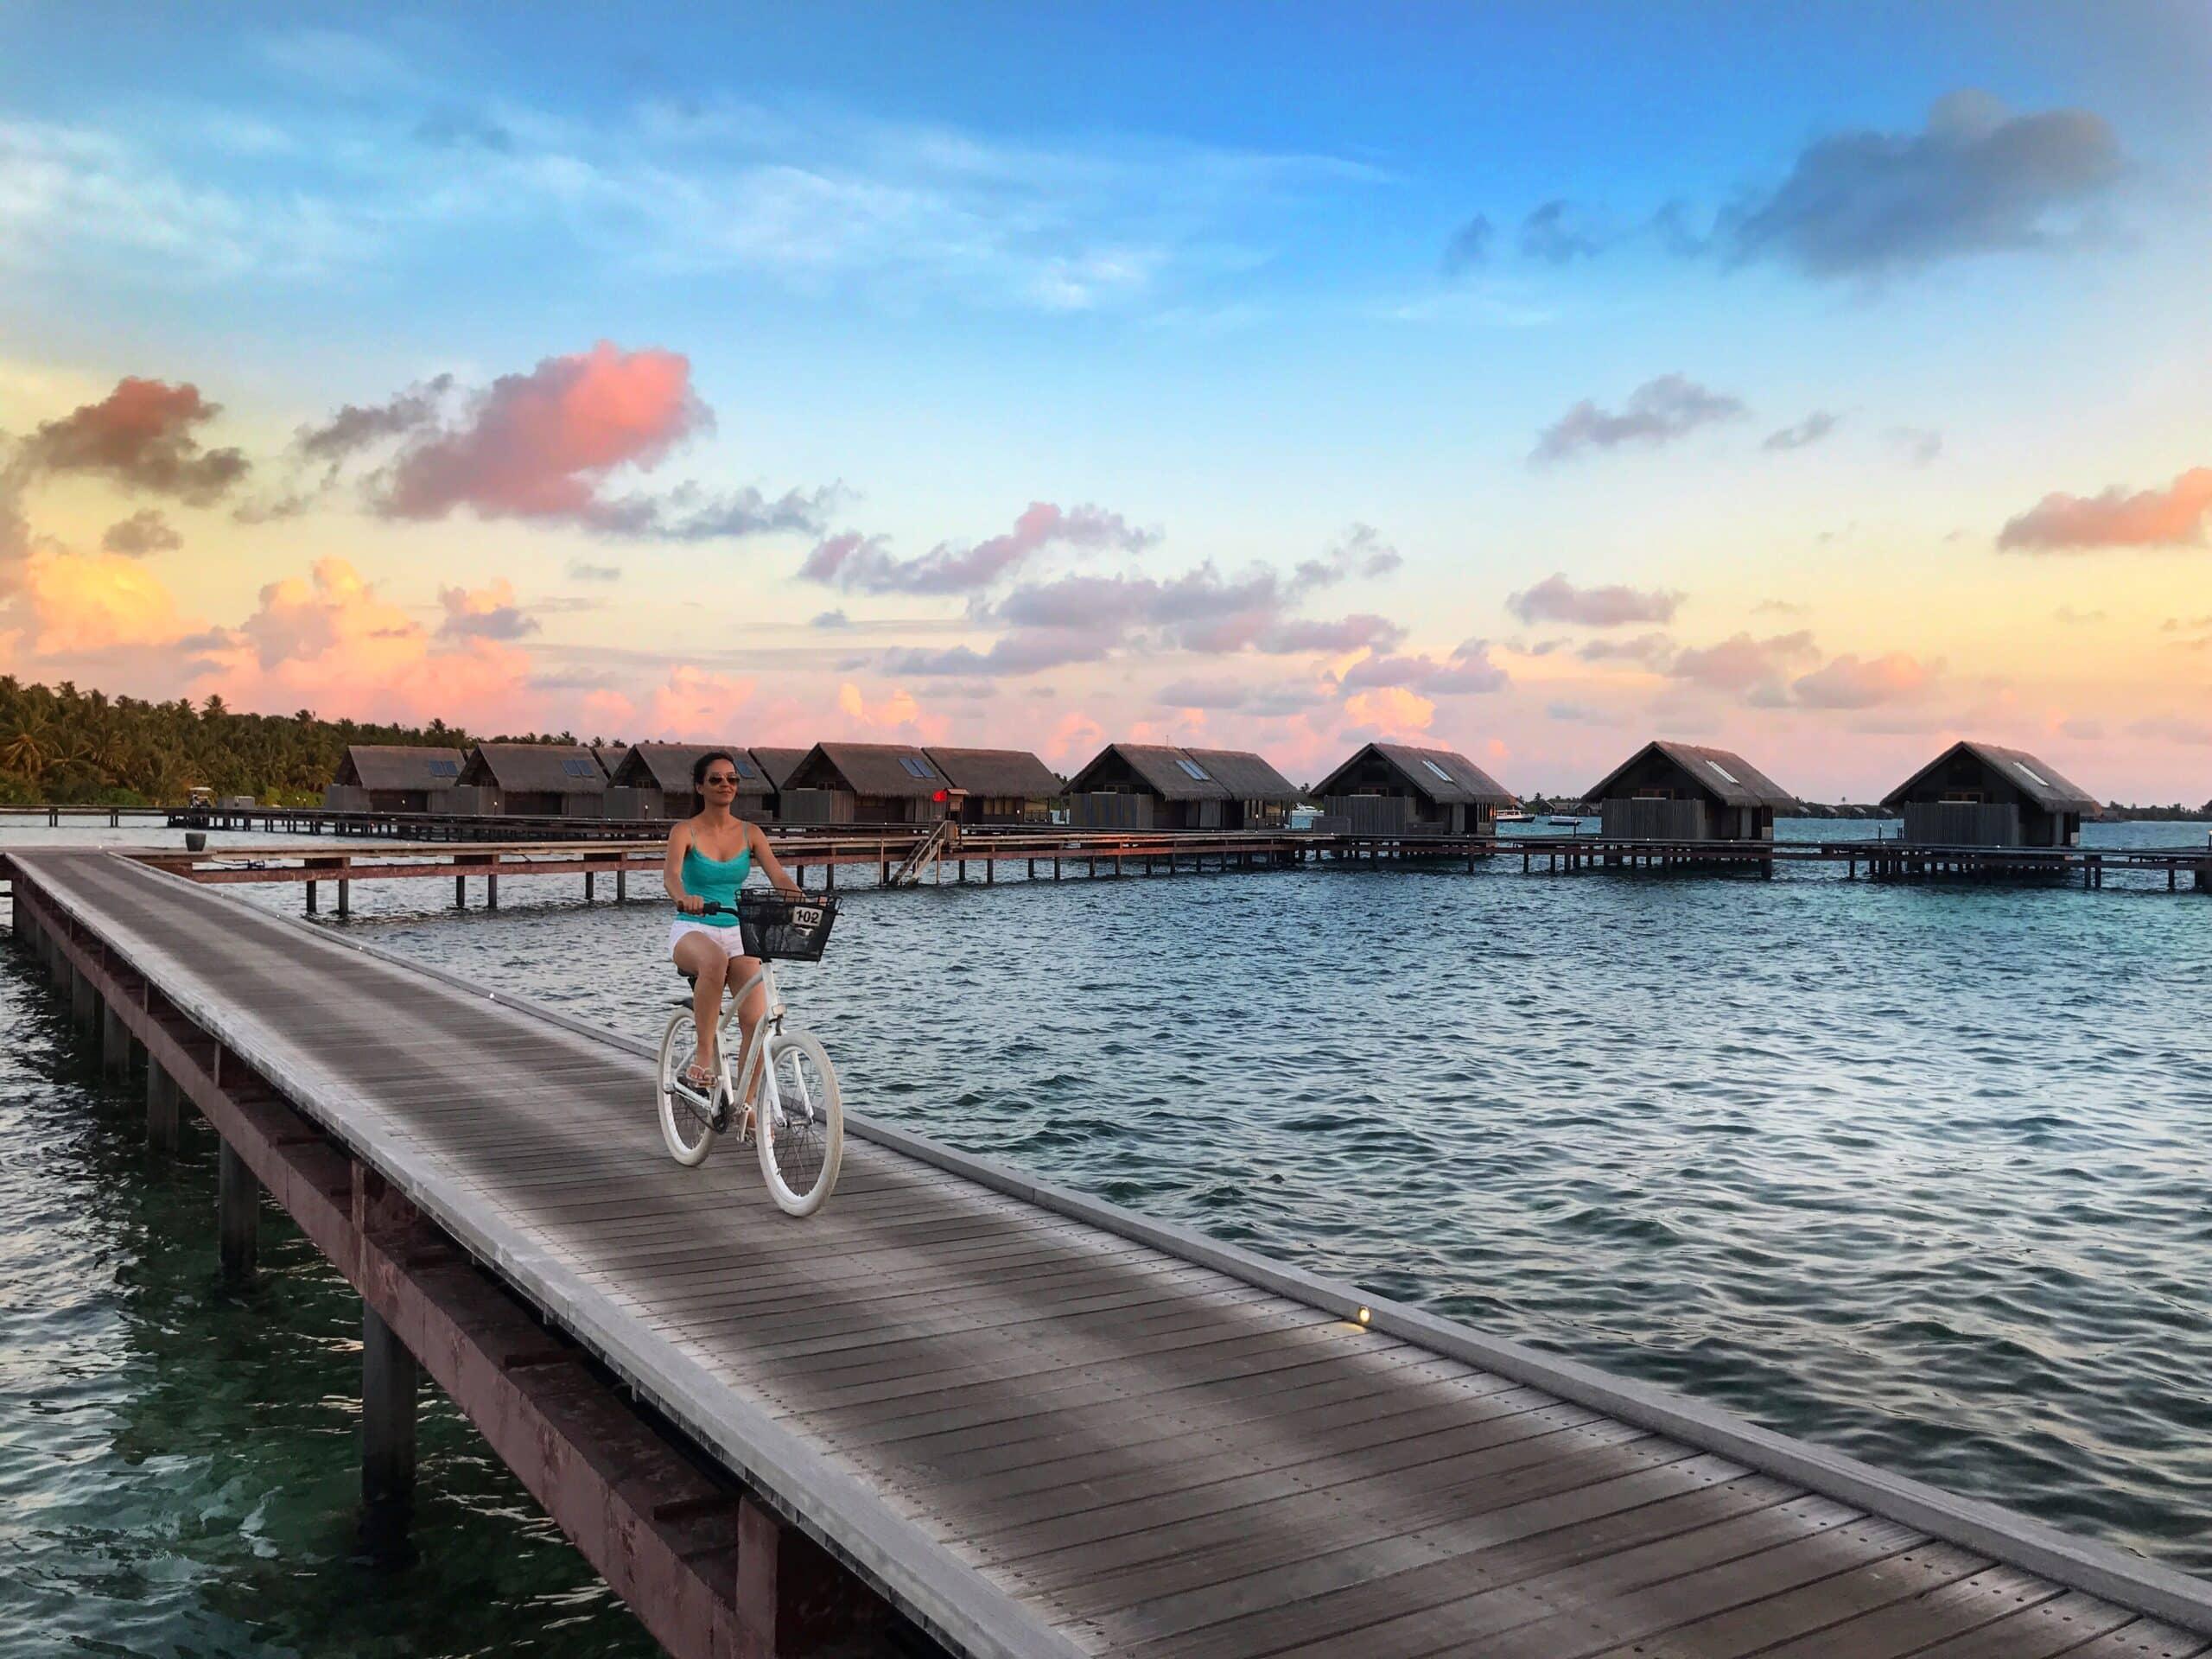 Andar de bicicleta no Shangri-La Maldivas